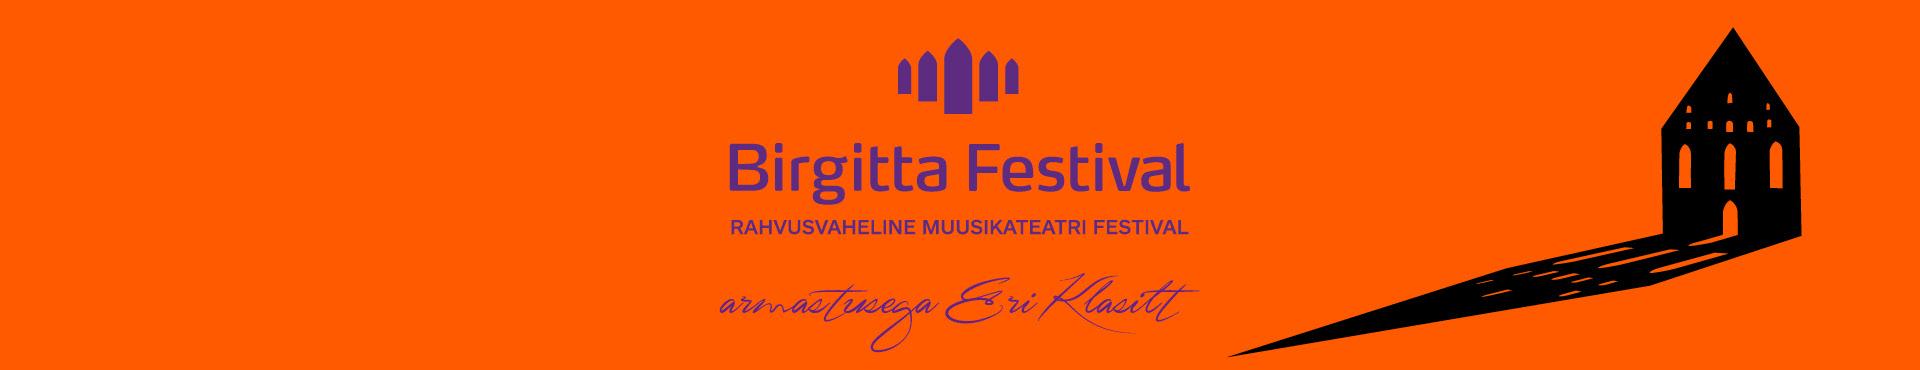 Birgitta Festival